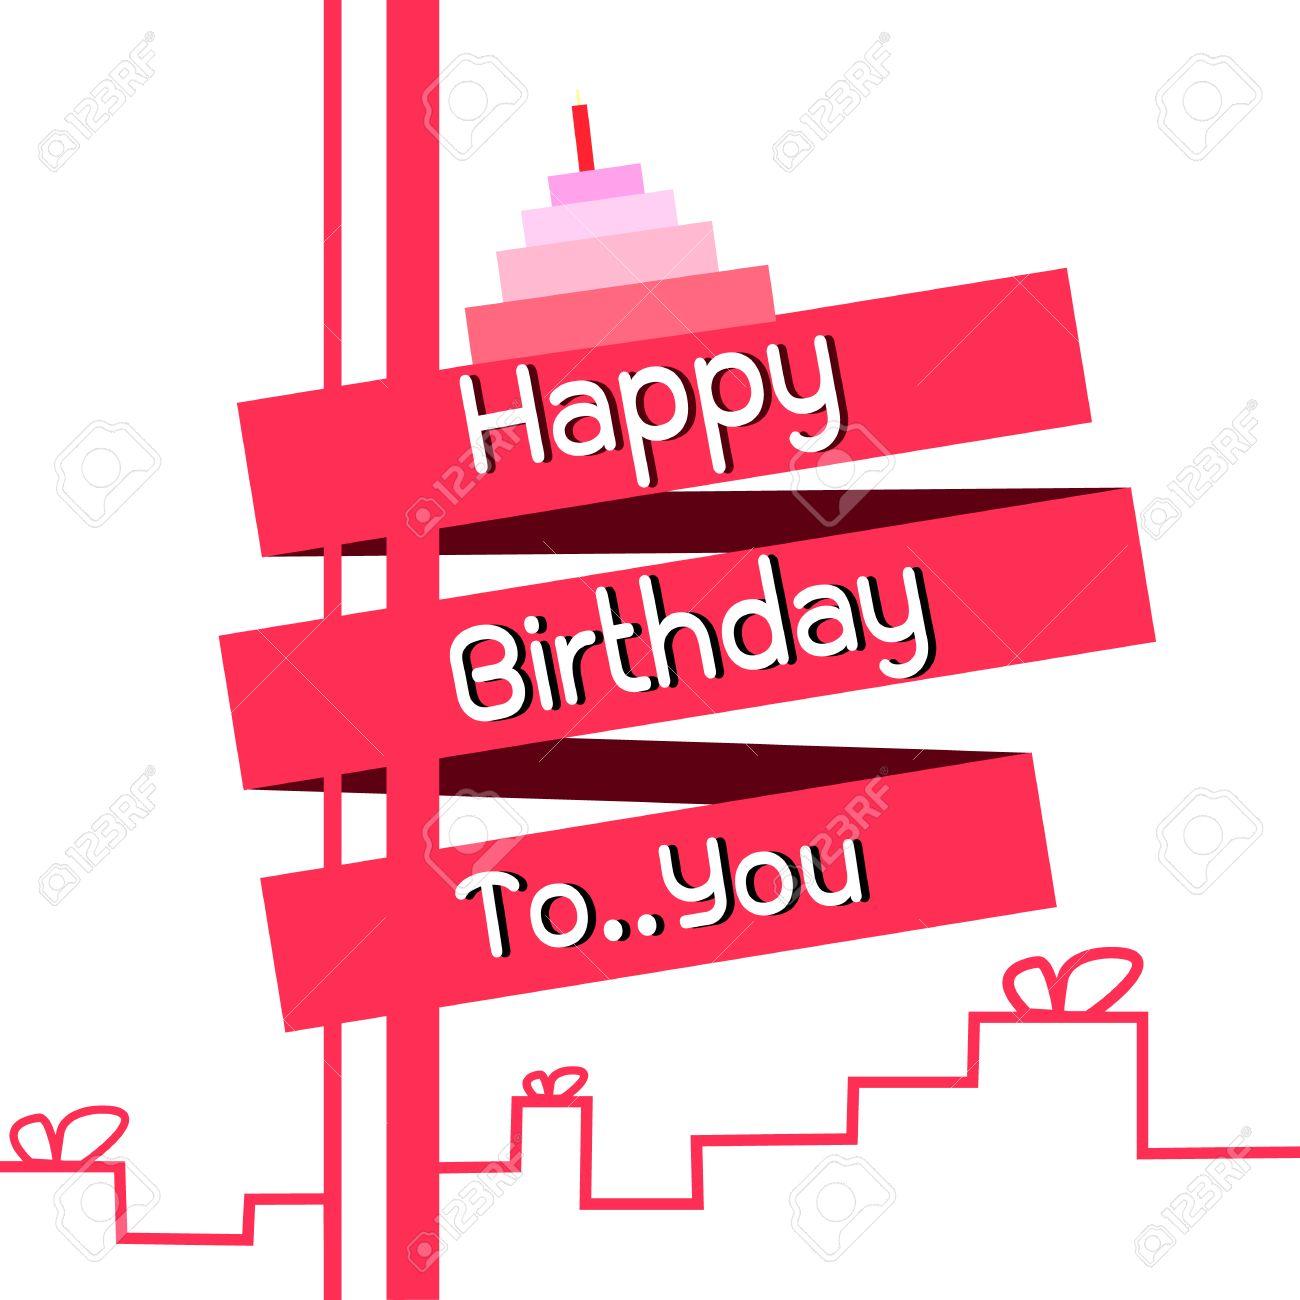 happy birthday cards templates. birthday ecards,happy birthday, Birthday card